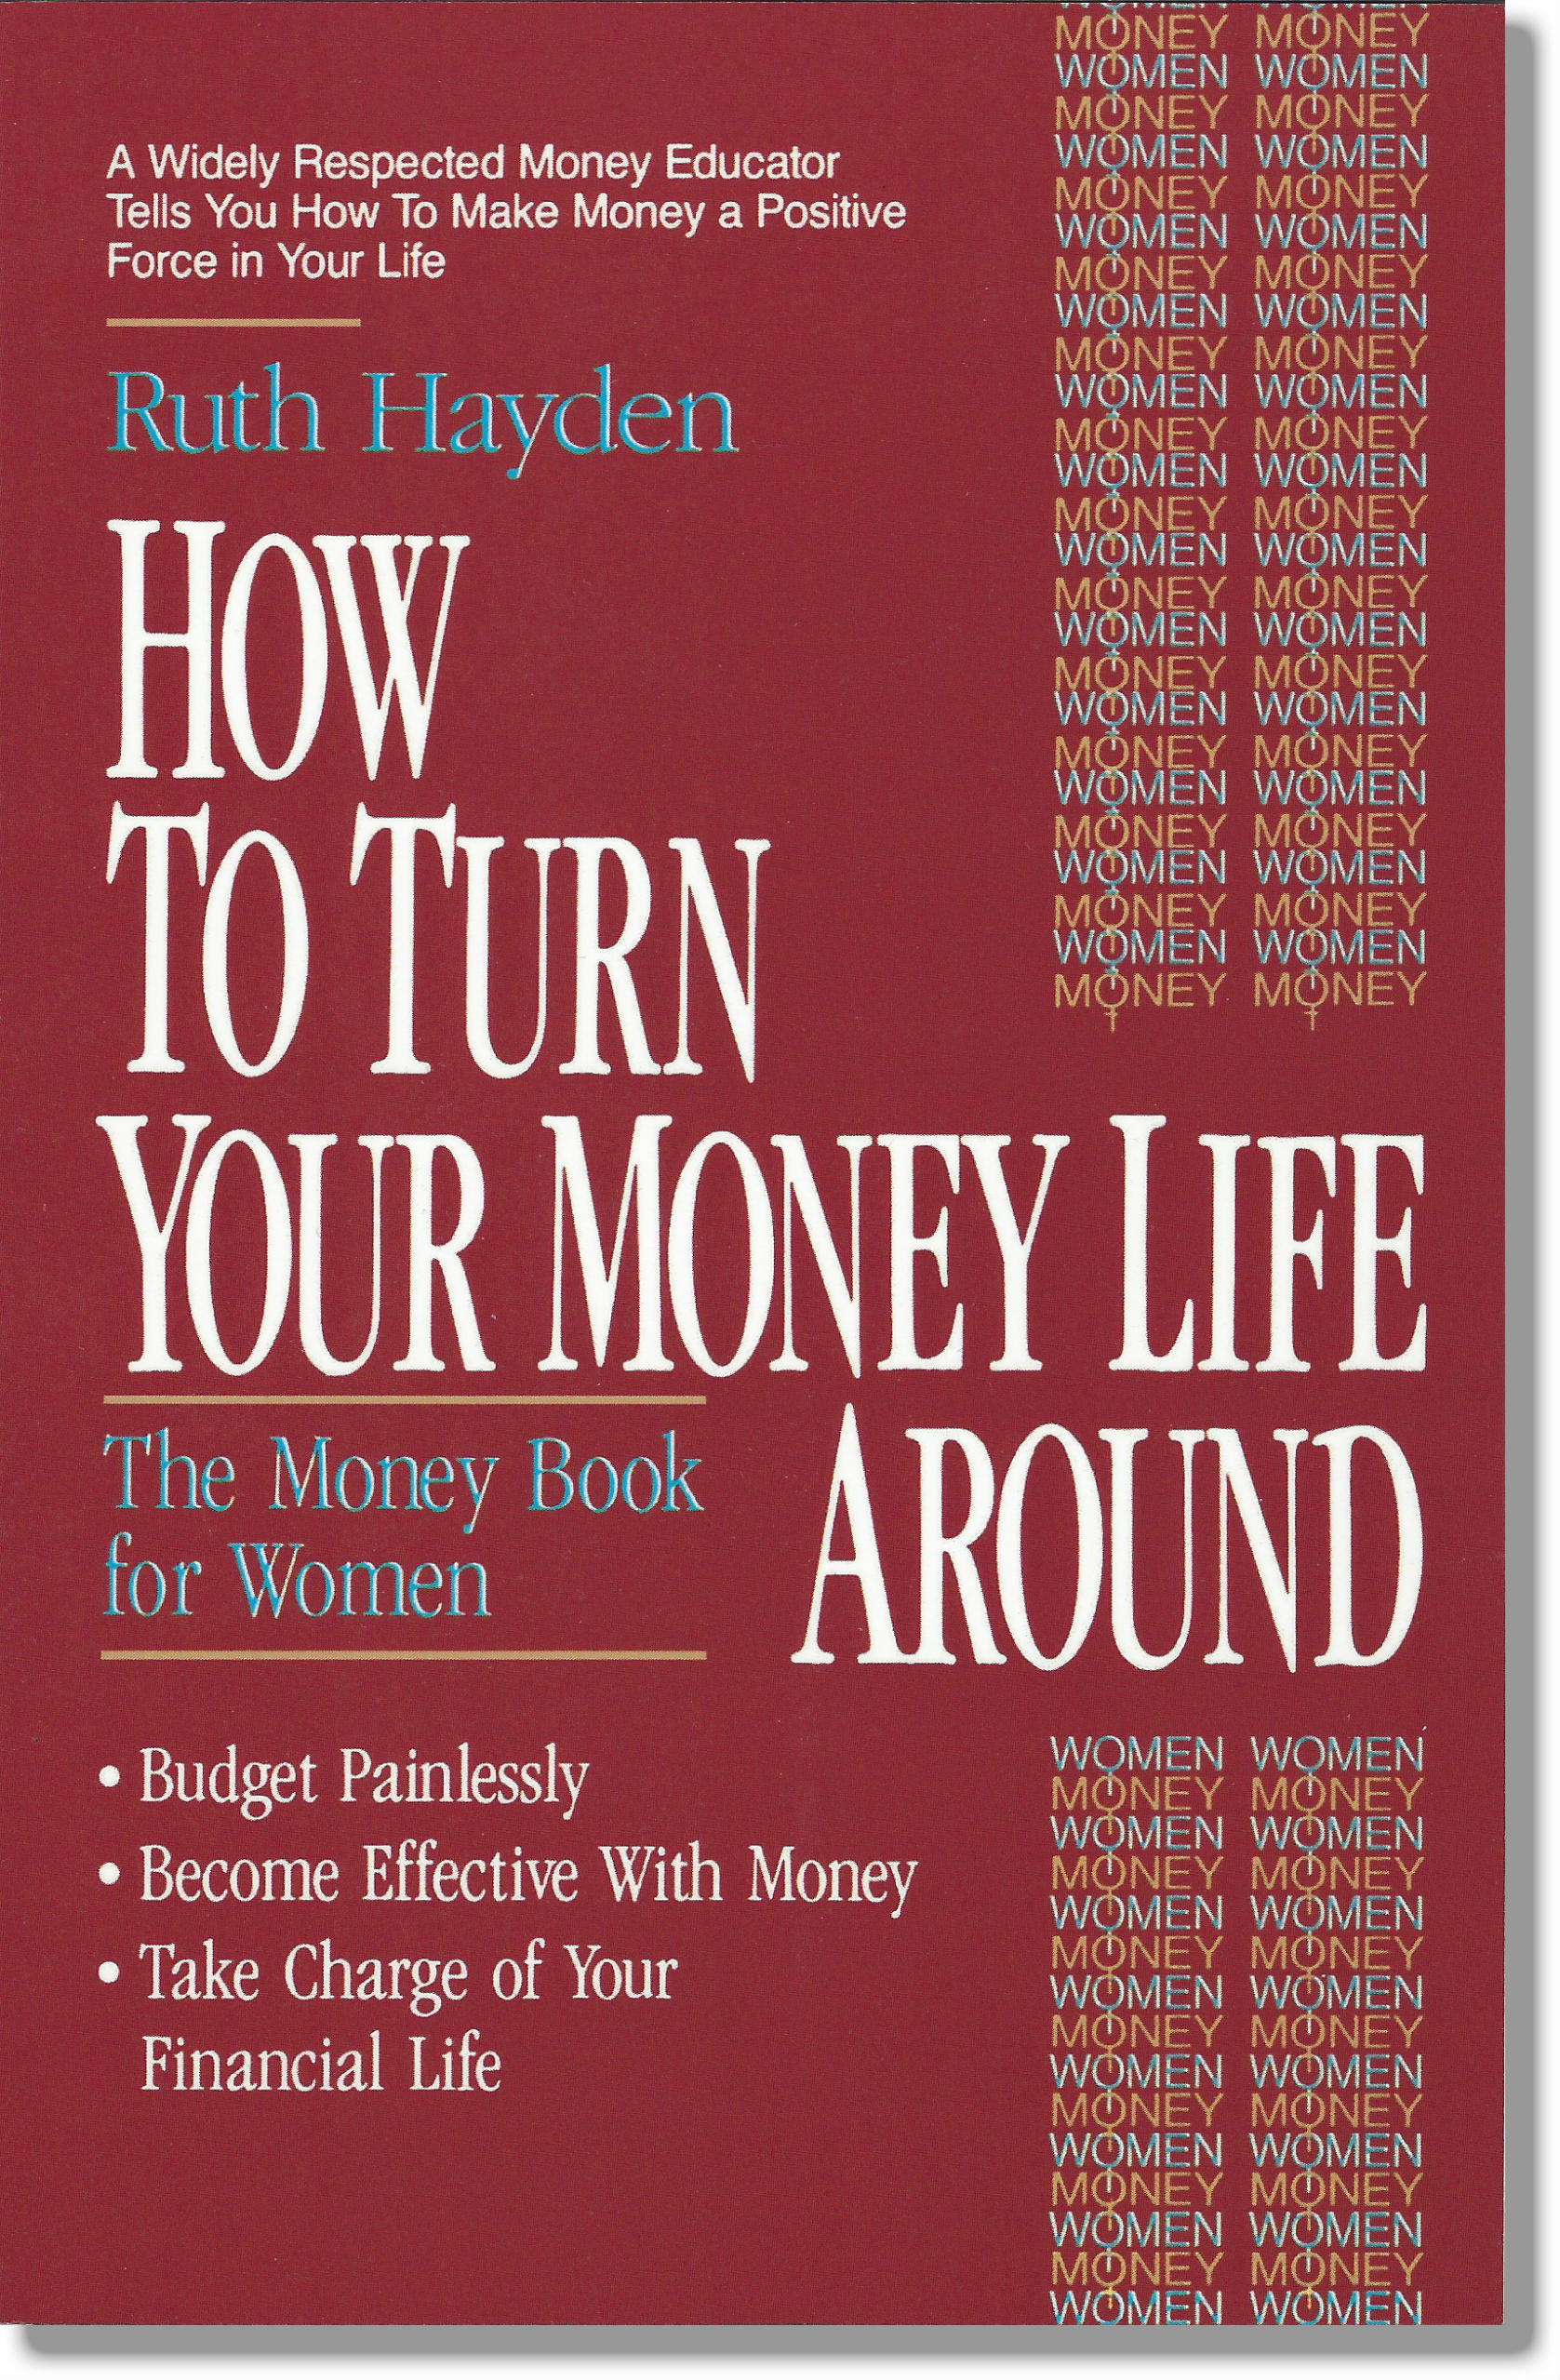 How To Turn Your Money Life Around